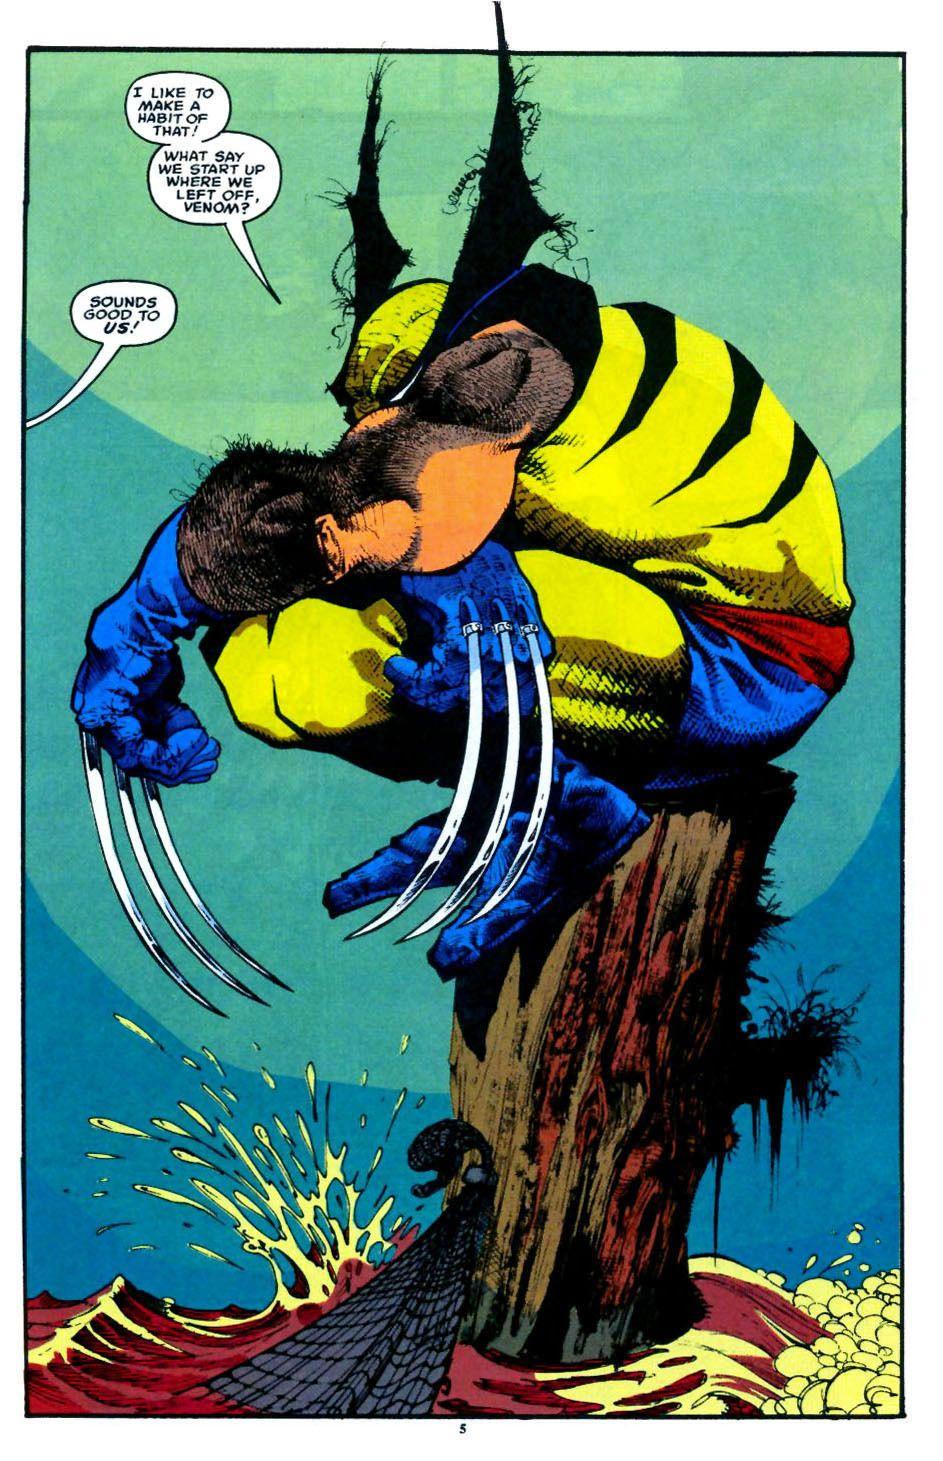 Travisellisor Page 5 From Marvel Comics Presents 1988 119 By Sam Kieth Mike Thomas Howard Mackie Diana Al Wolverine Comic Art Wolverine Comic Comic Art